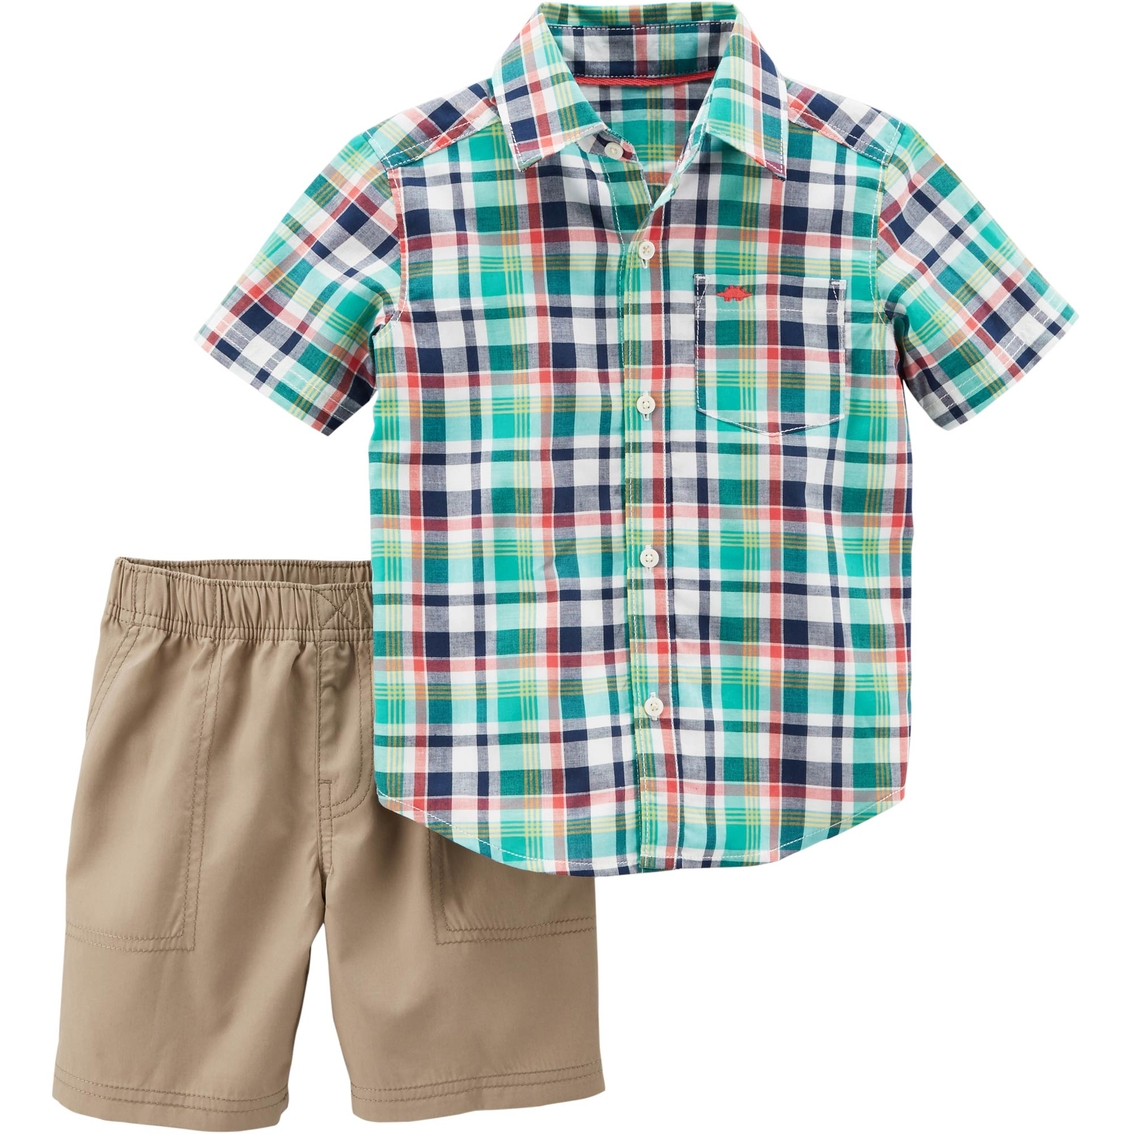 c5a979cb2 Carter's Toddler Boys 2 Pc. Plaid Shirt And Shorts Set | Toddler ...